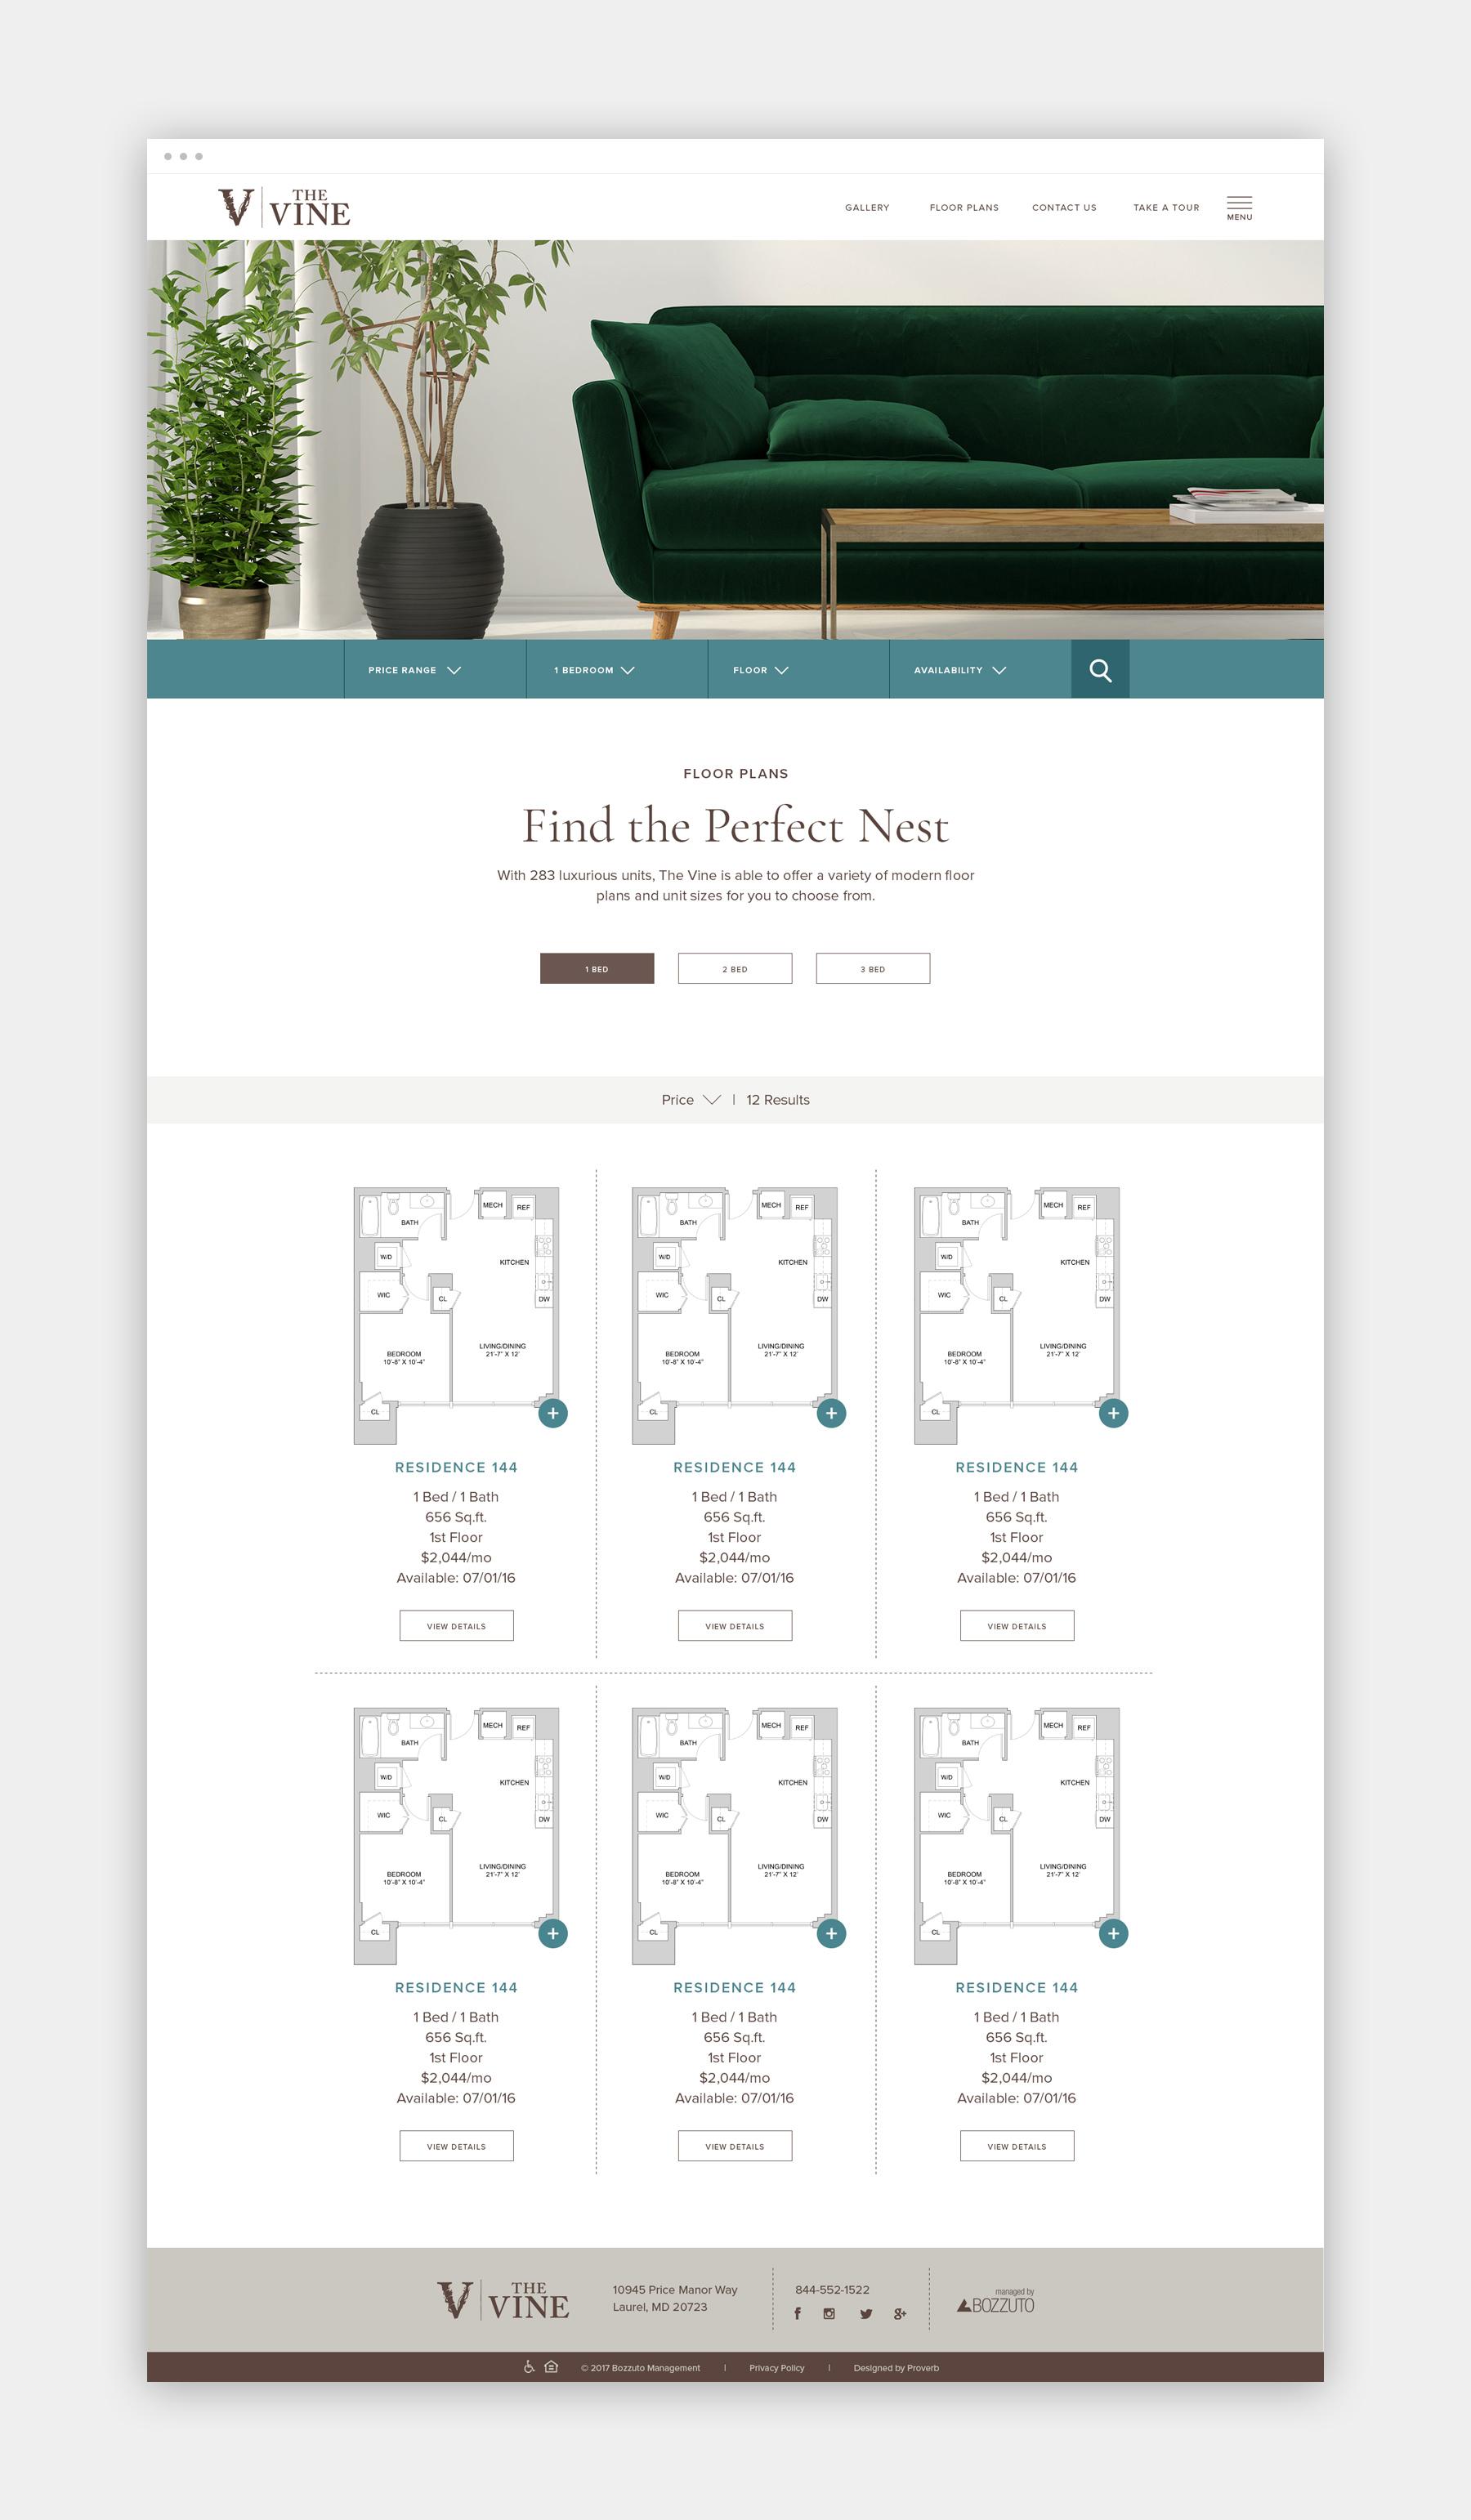 TheVine_floorplans_results.jpg